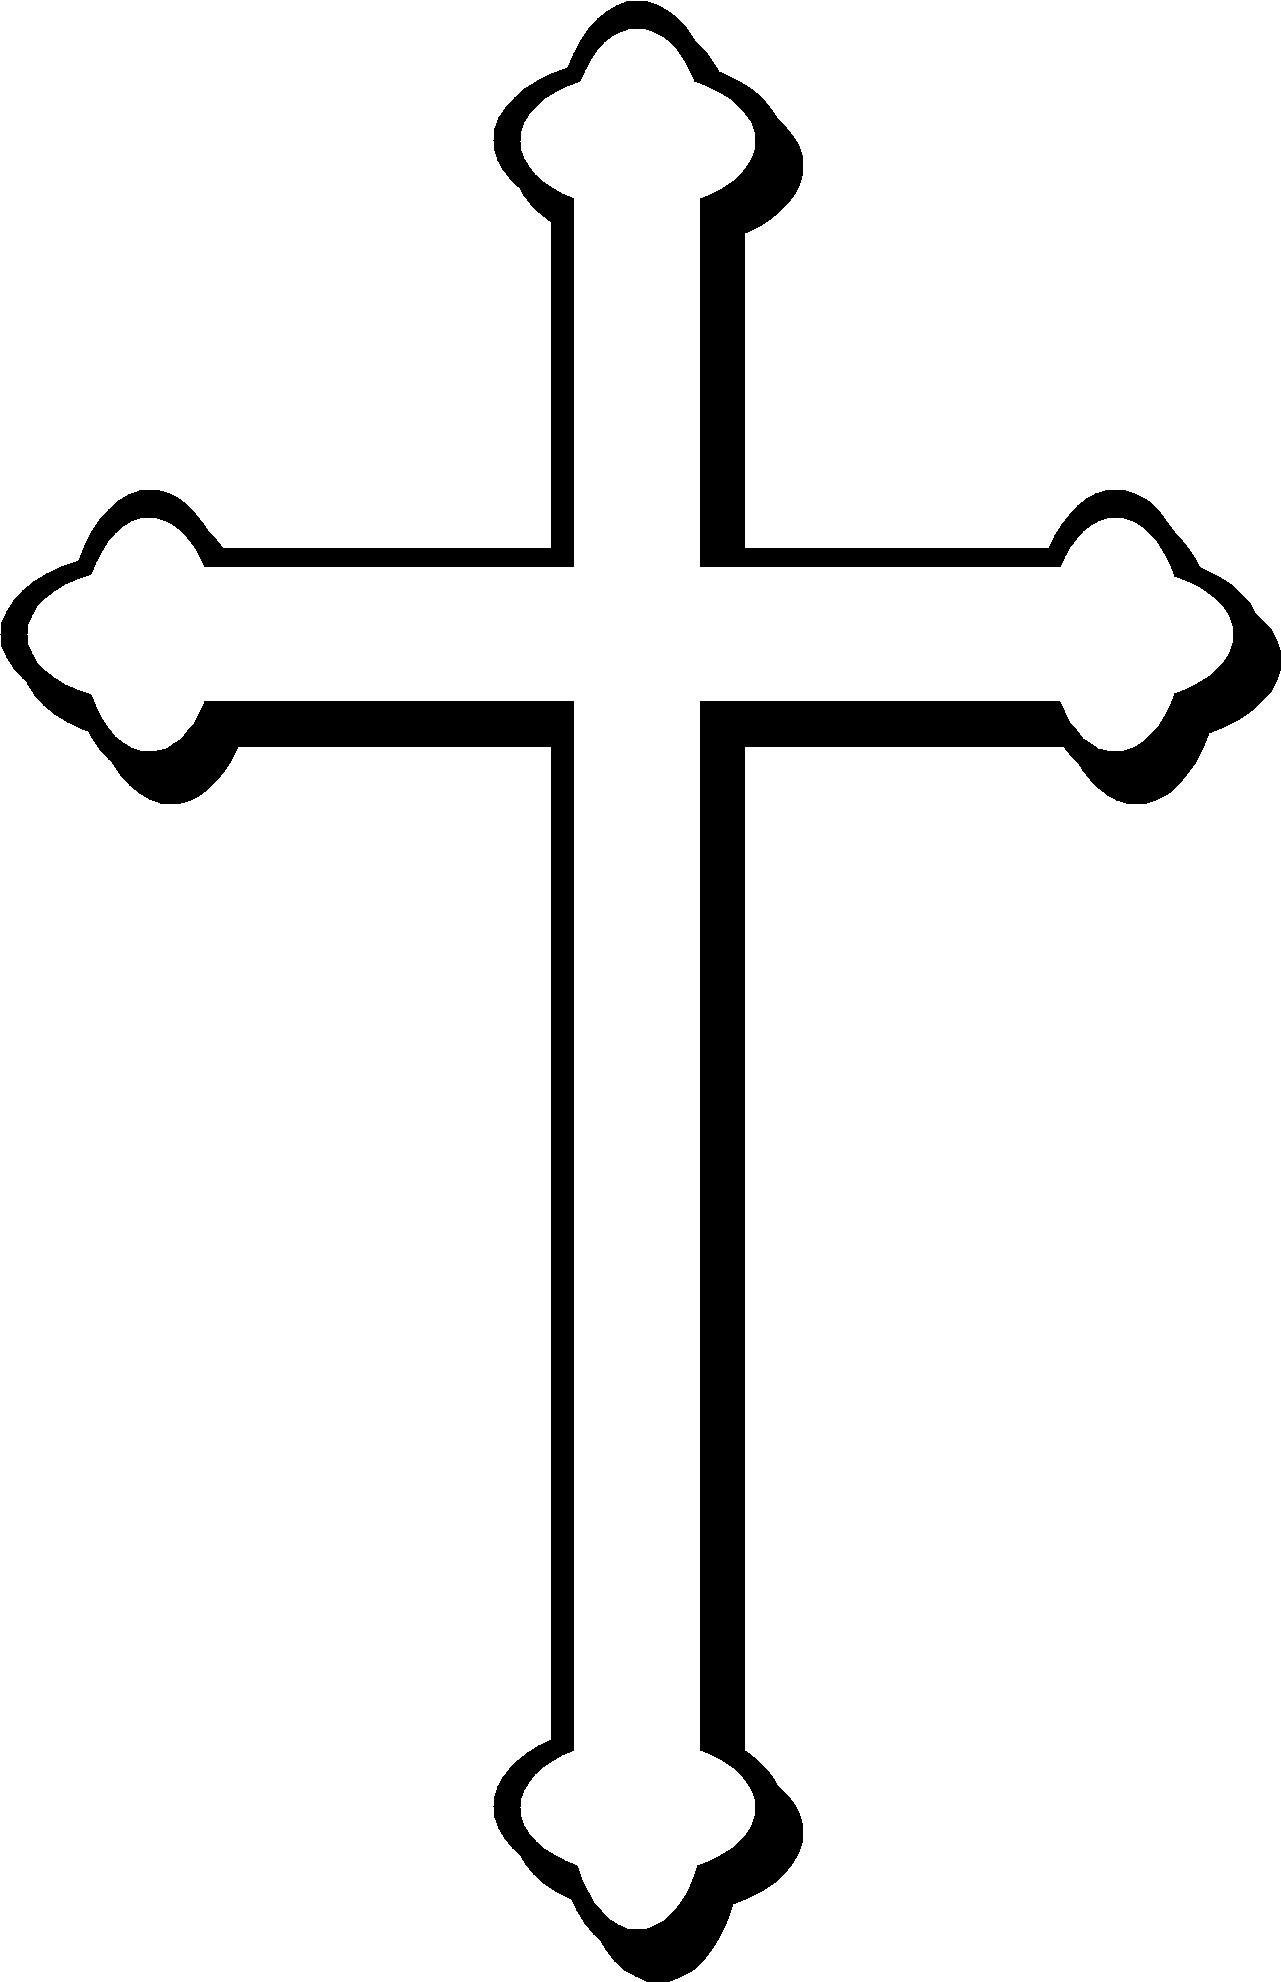 Free Christian Symbols Cliparts, Download Free Clip Art.